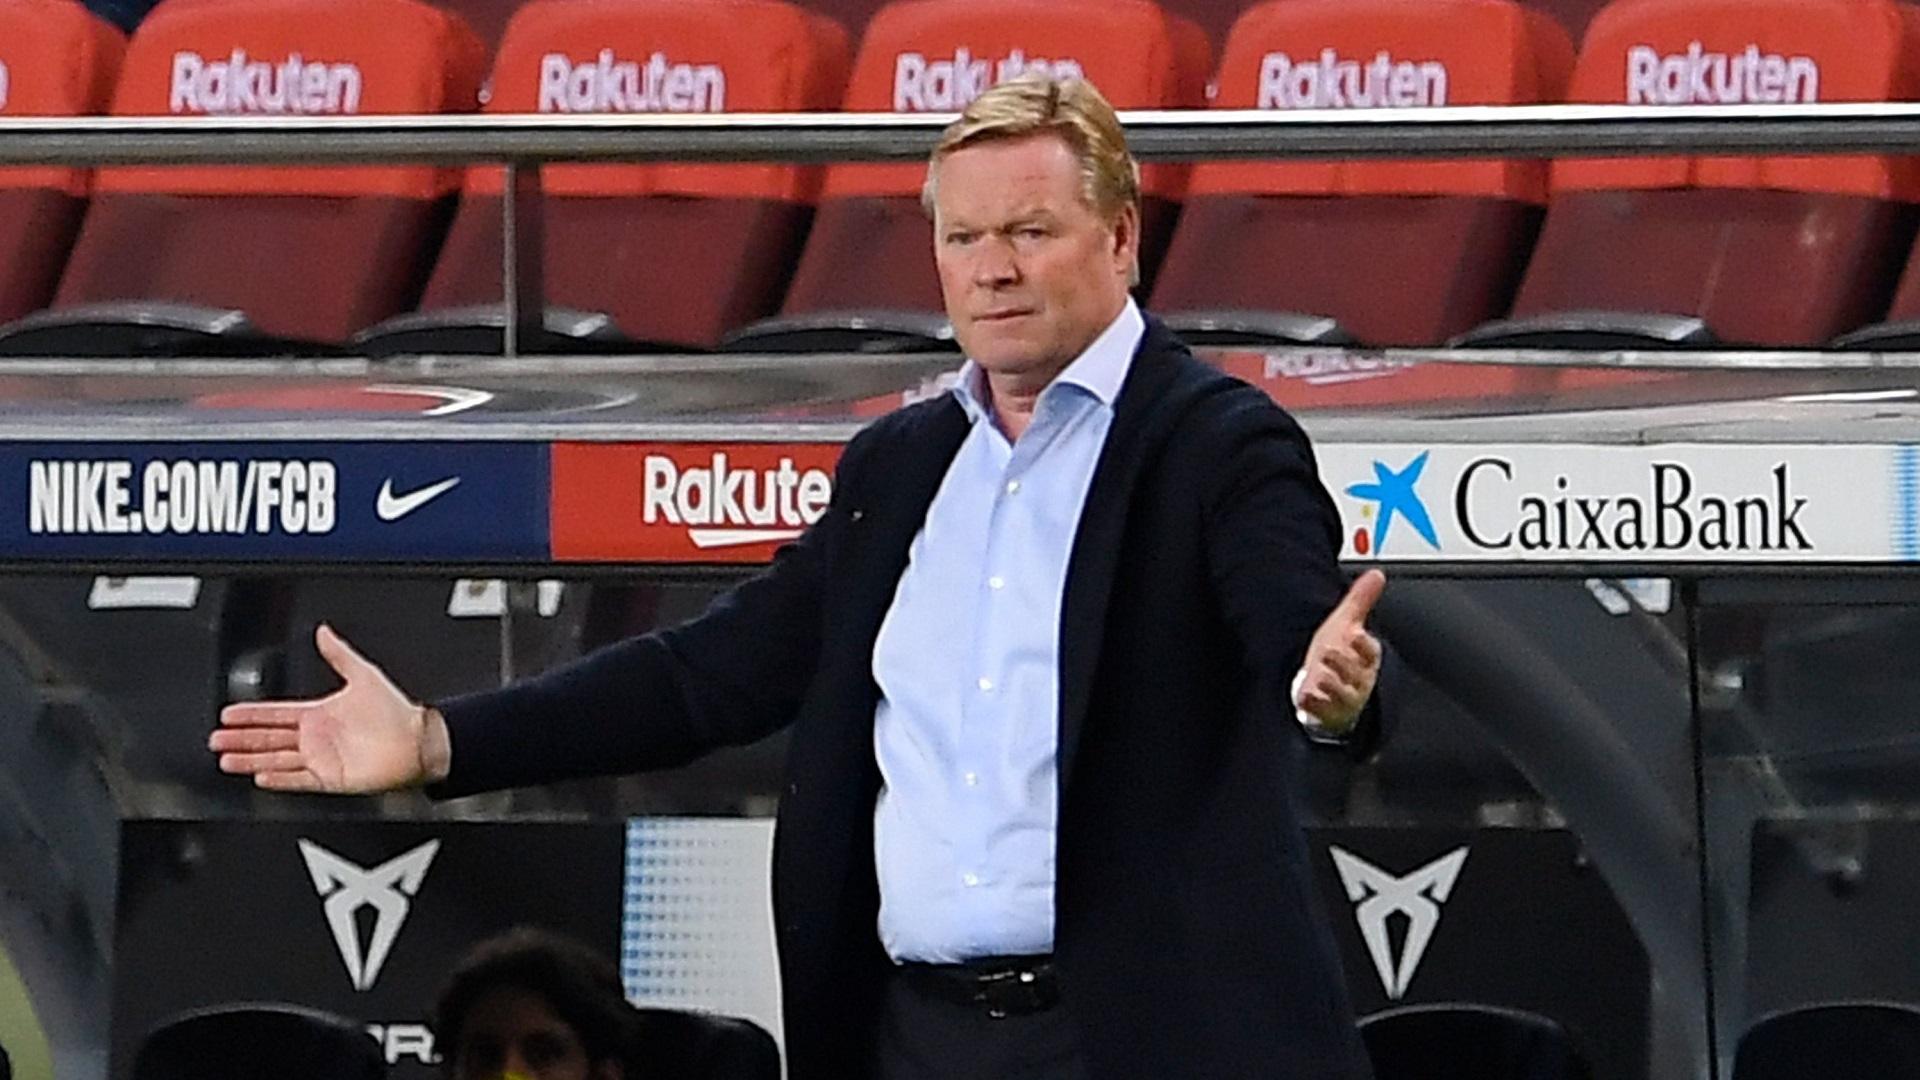 Barcelona interim president backs embattled manager Koeman